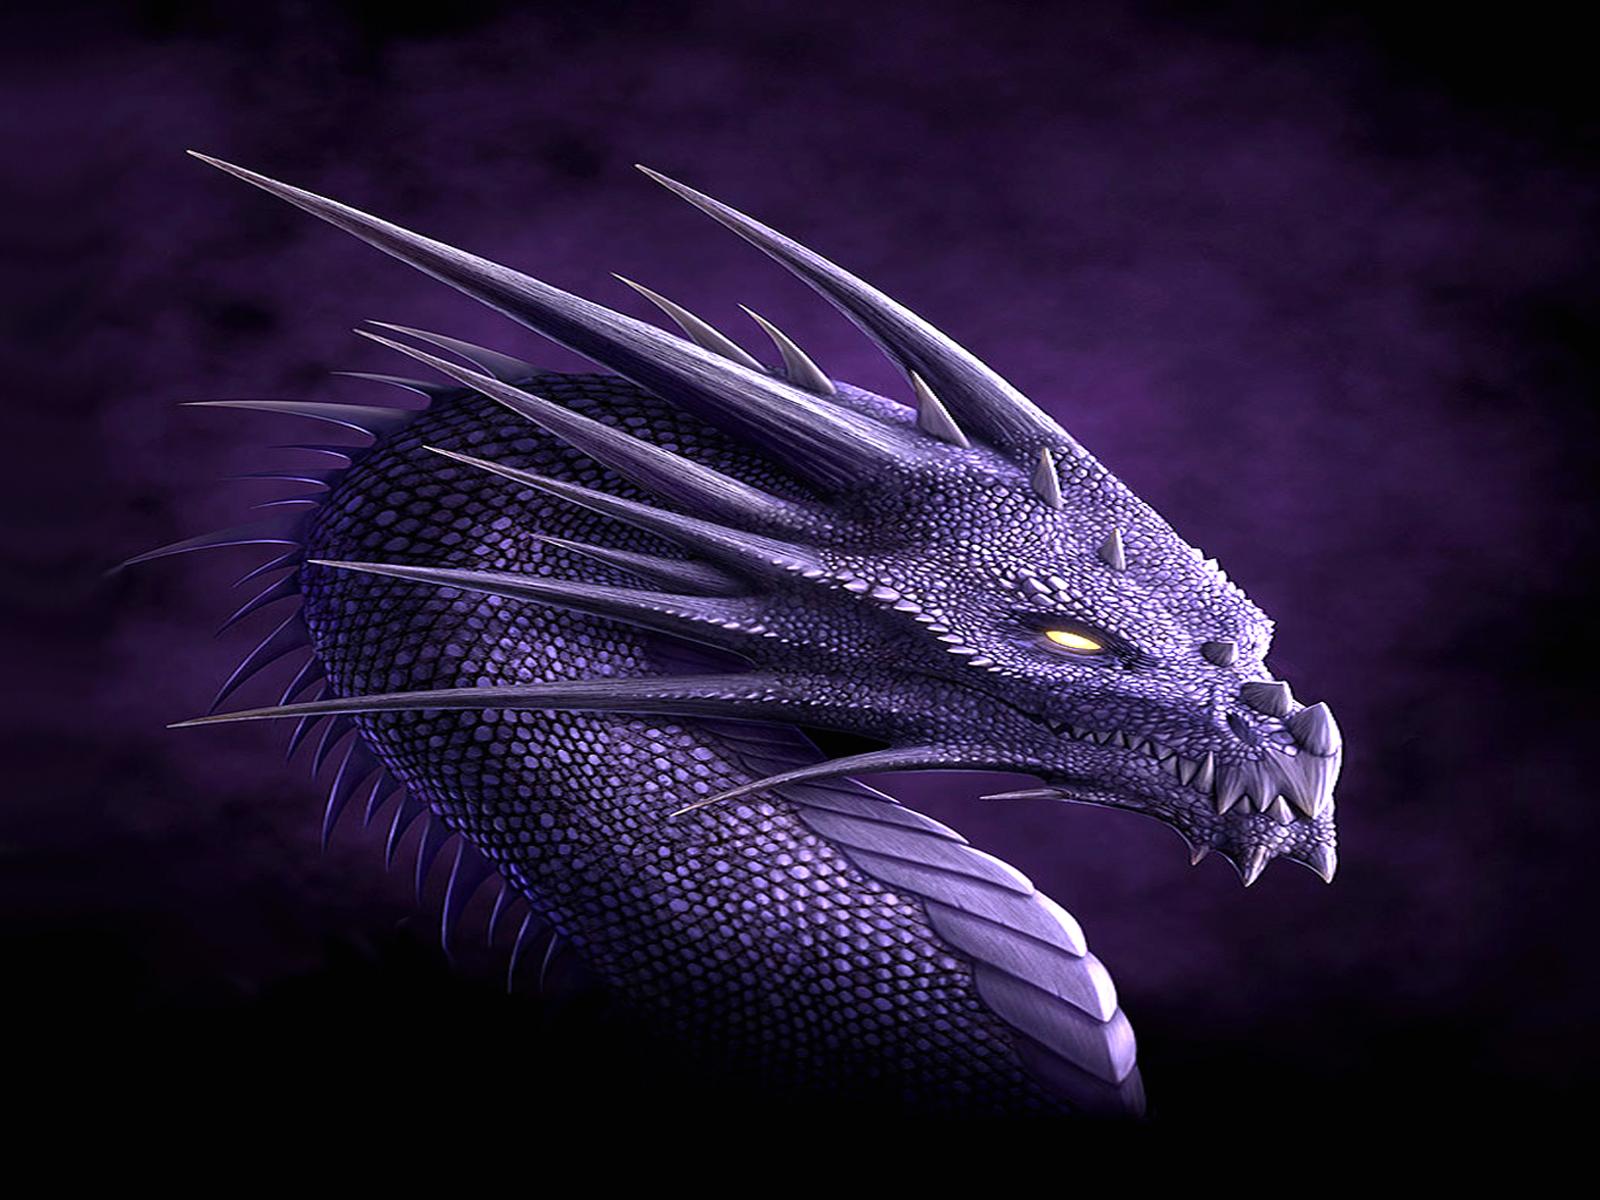 Fantasy - Drachen  Lila Wallpaper